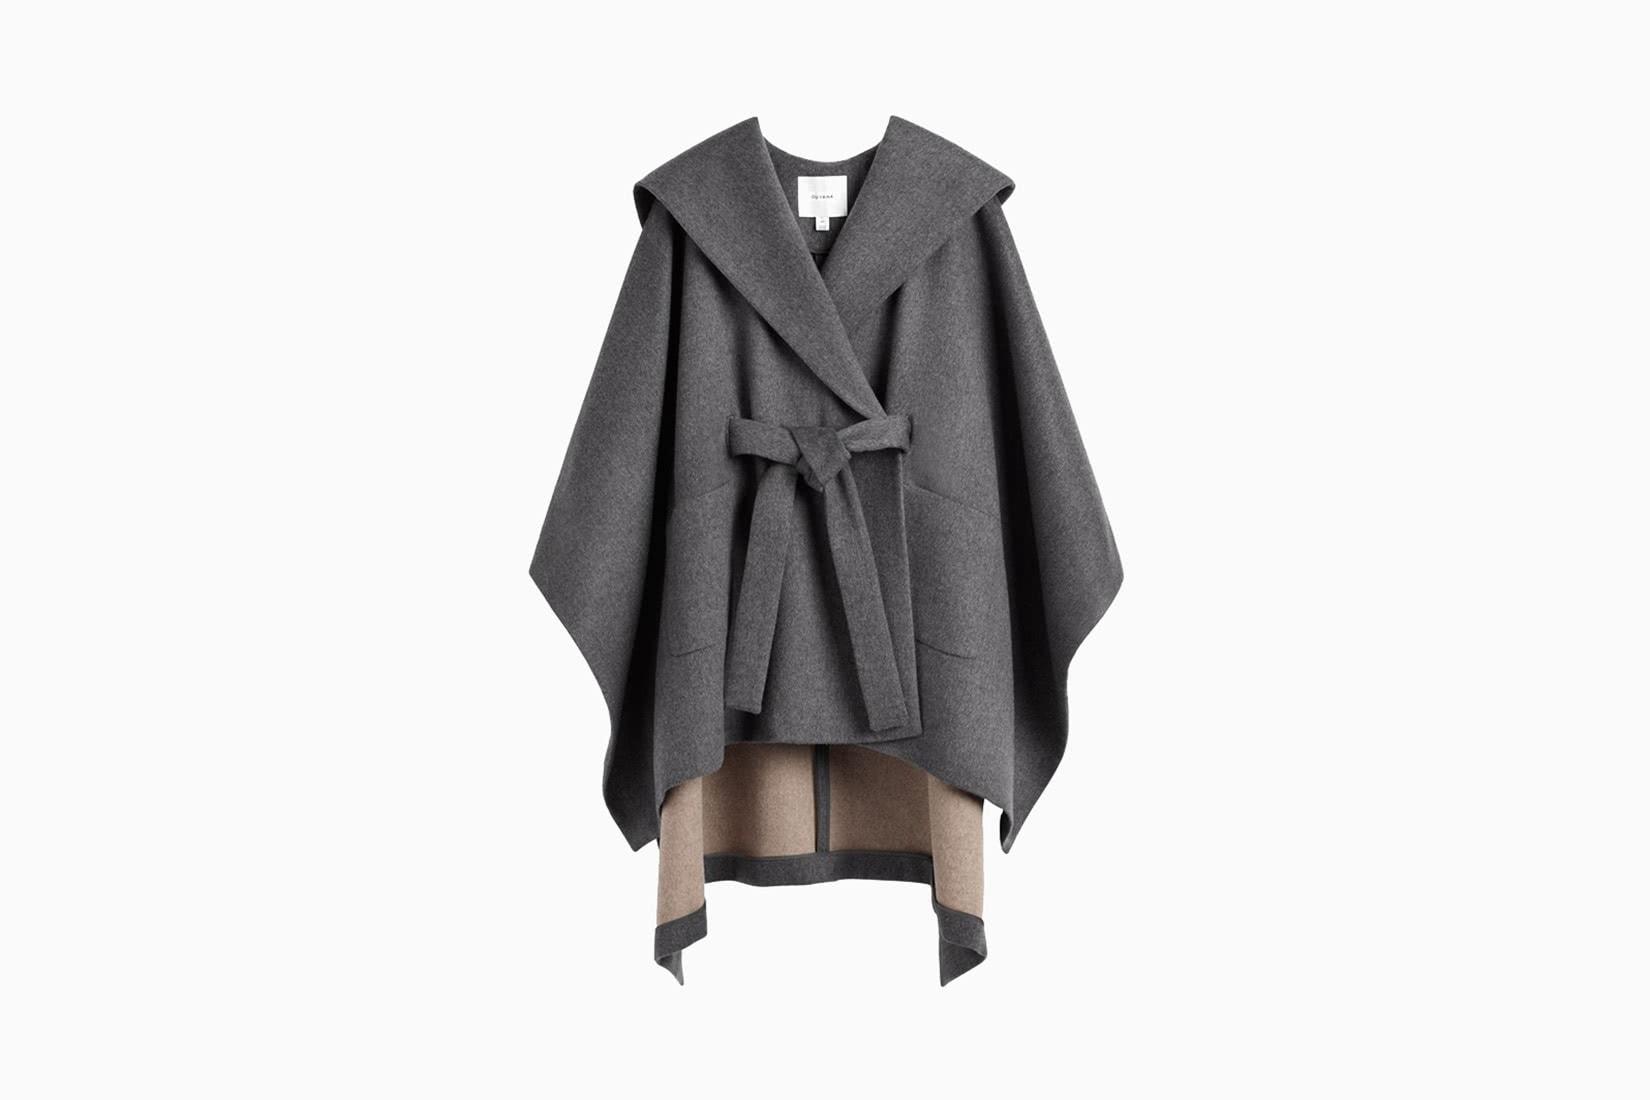 best winter coats women cuyana hooded cape review - Luxe Digital